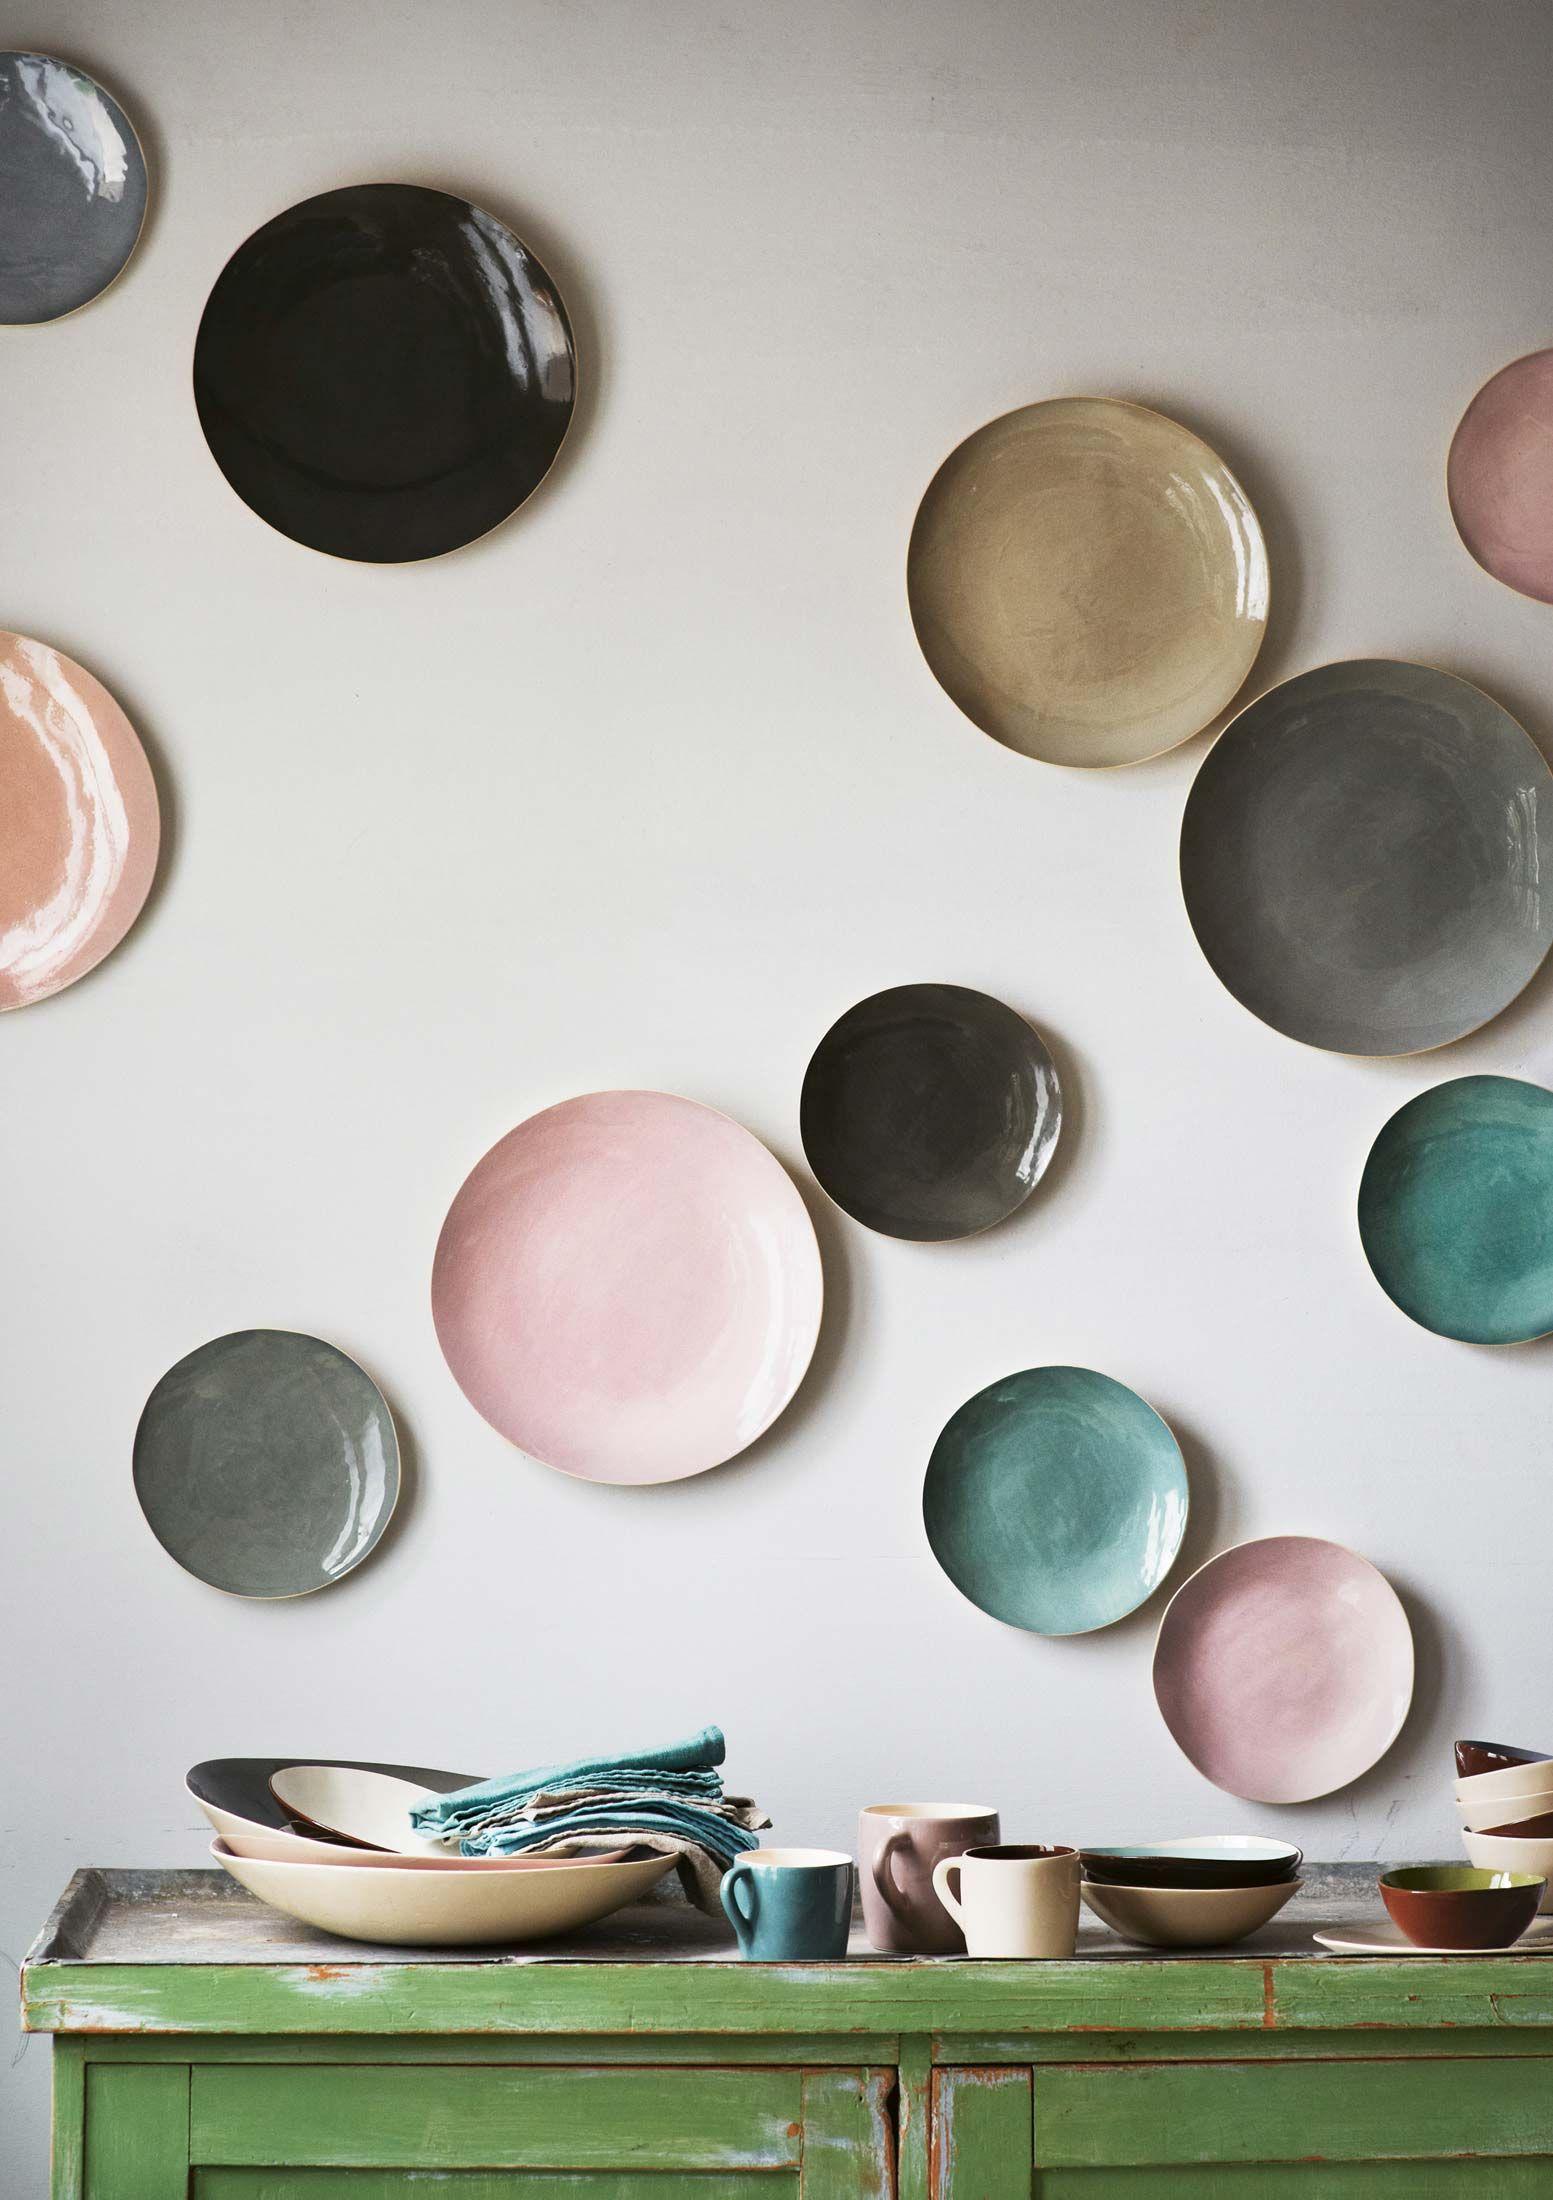 Wall decor - pretty plates #interiors #decoration #styling